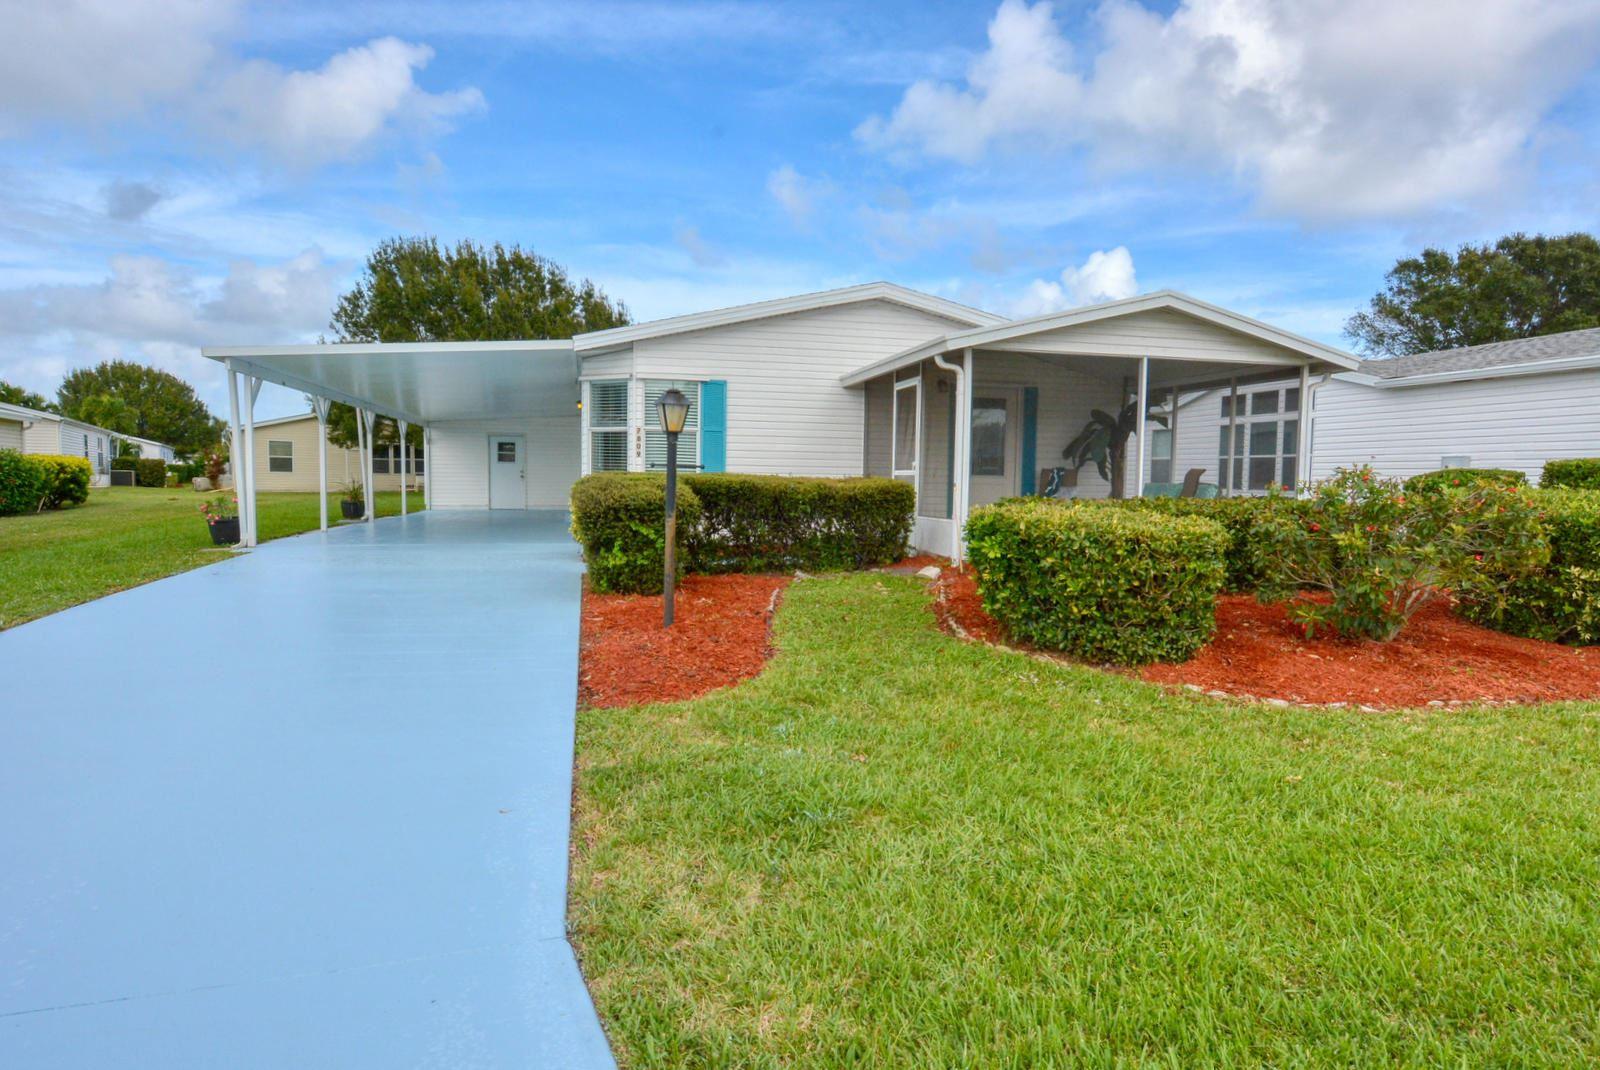 7809 Meadowlark Lane, Port Saint Lucie, FL 34952 - #: RX-10669509